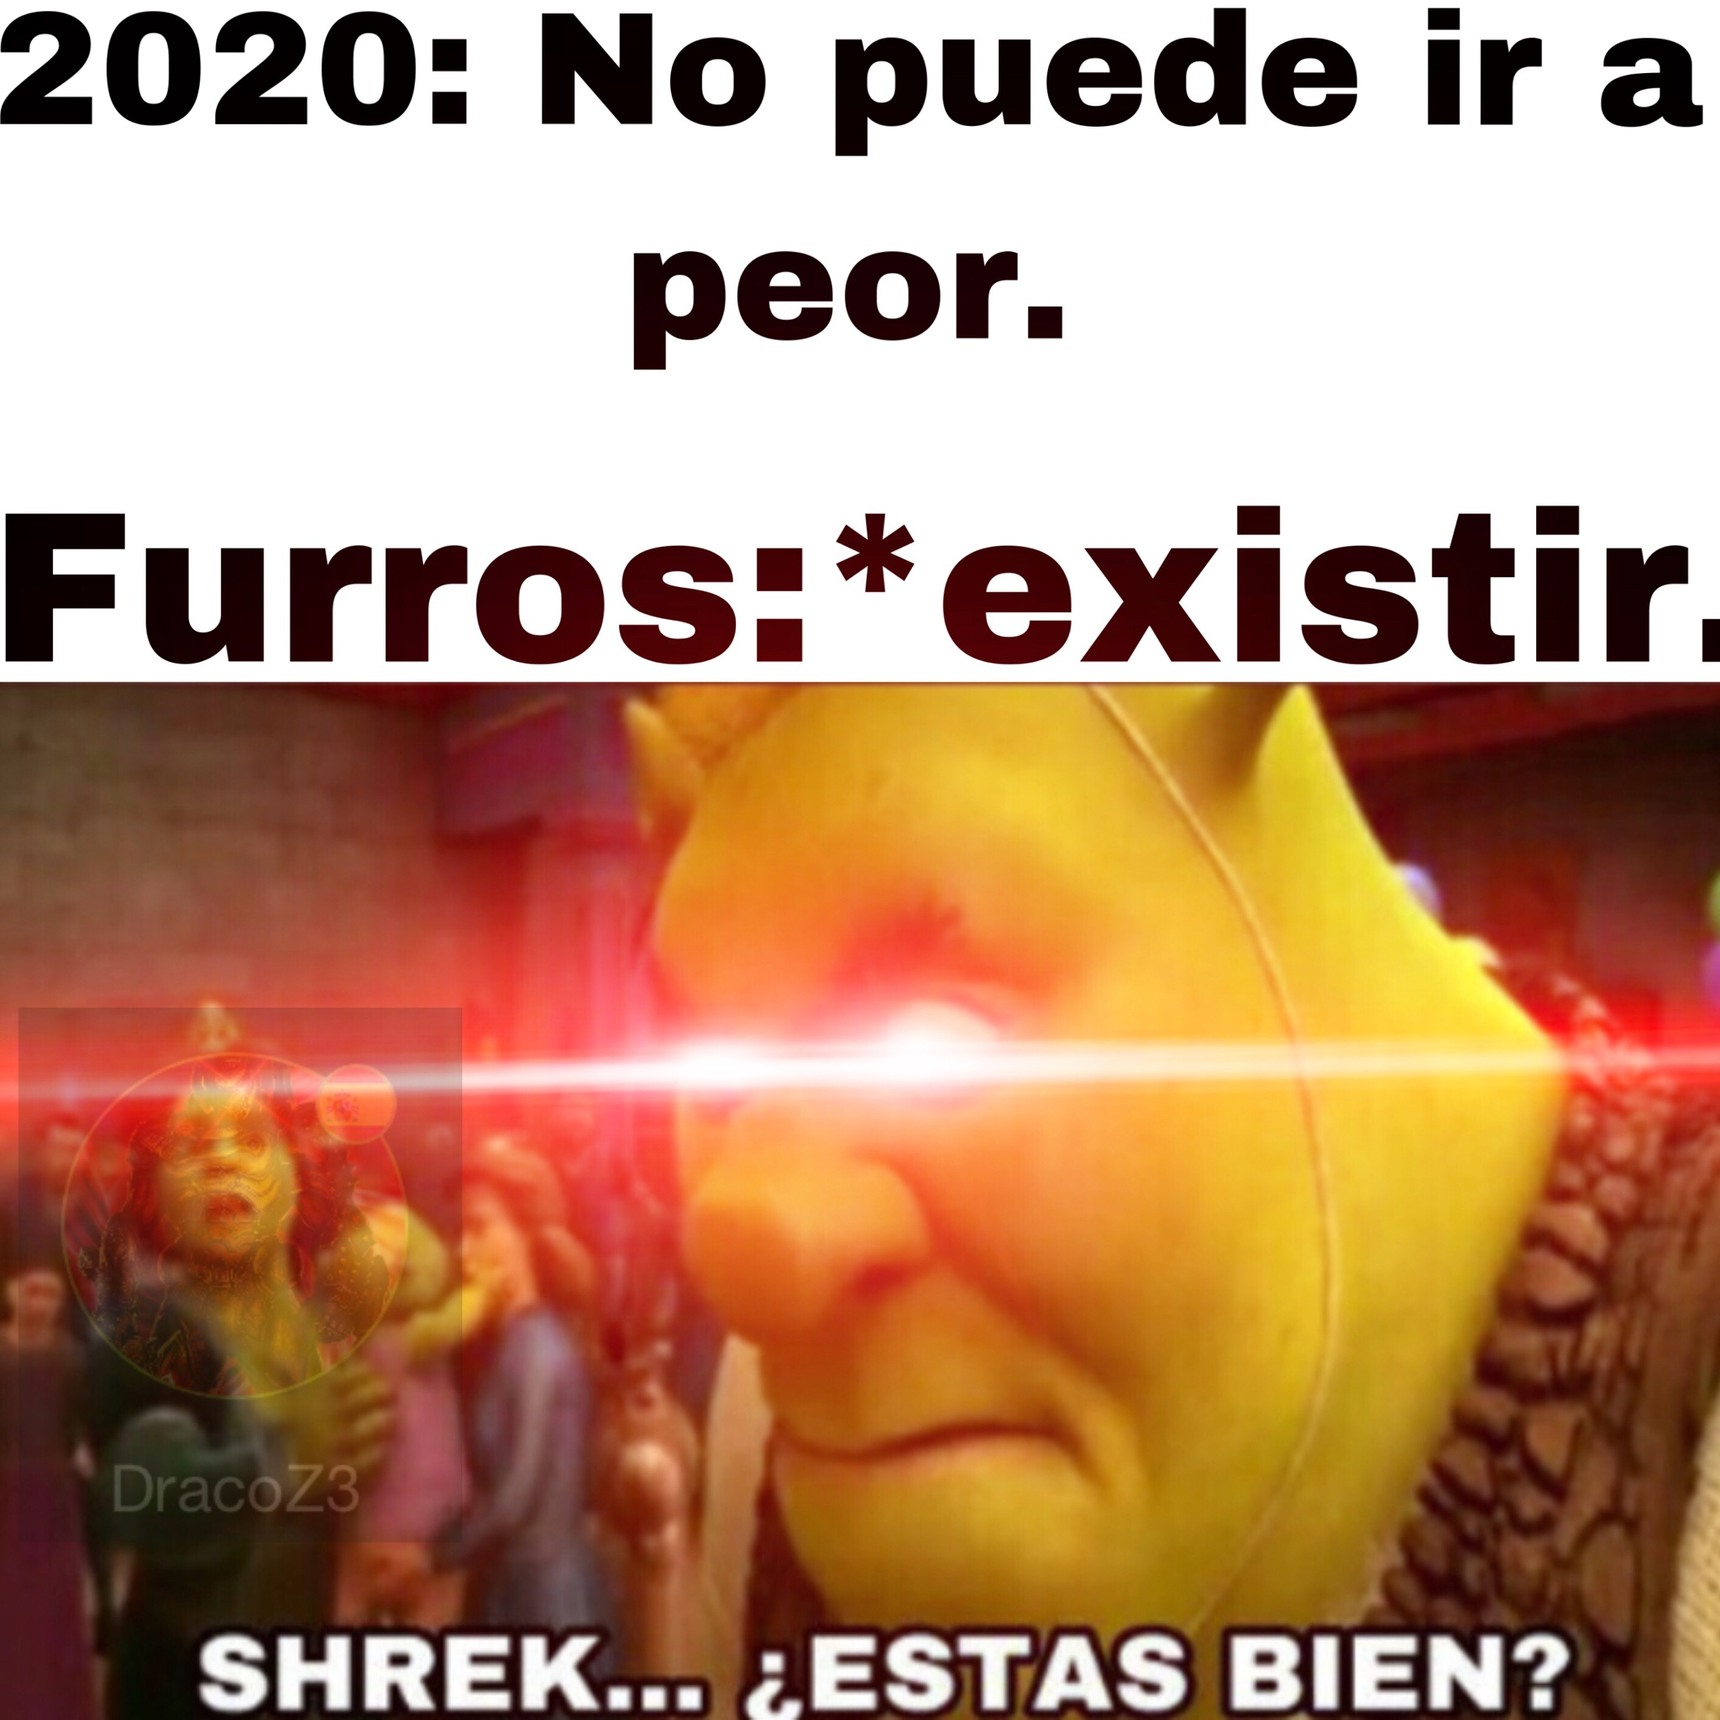 Shrek es la última esperanza... - meme